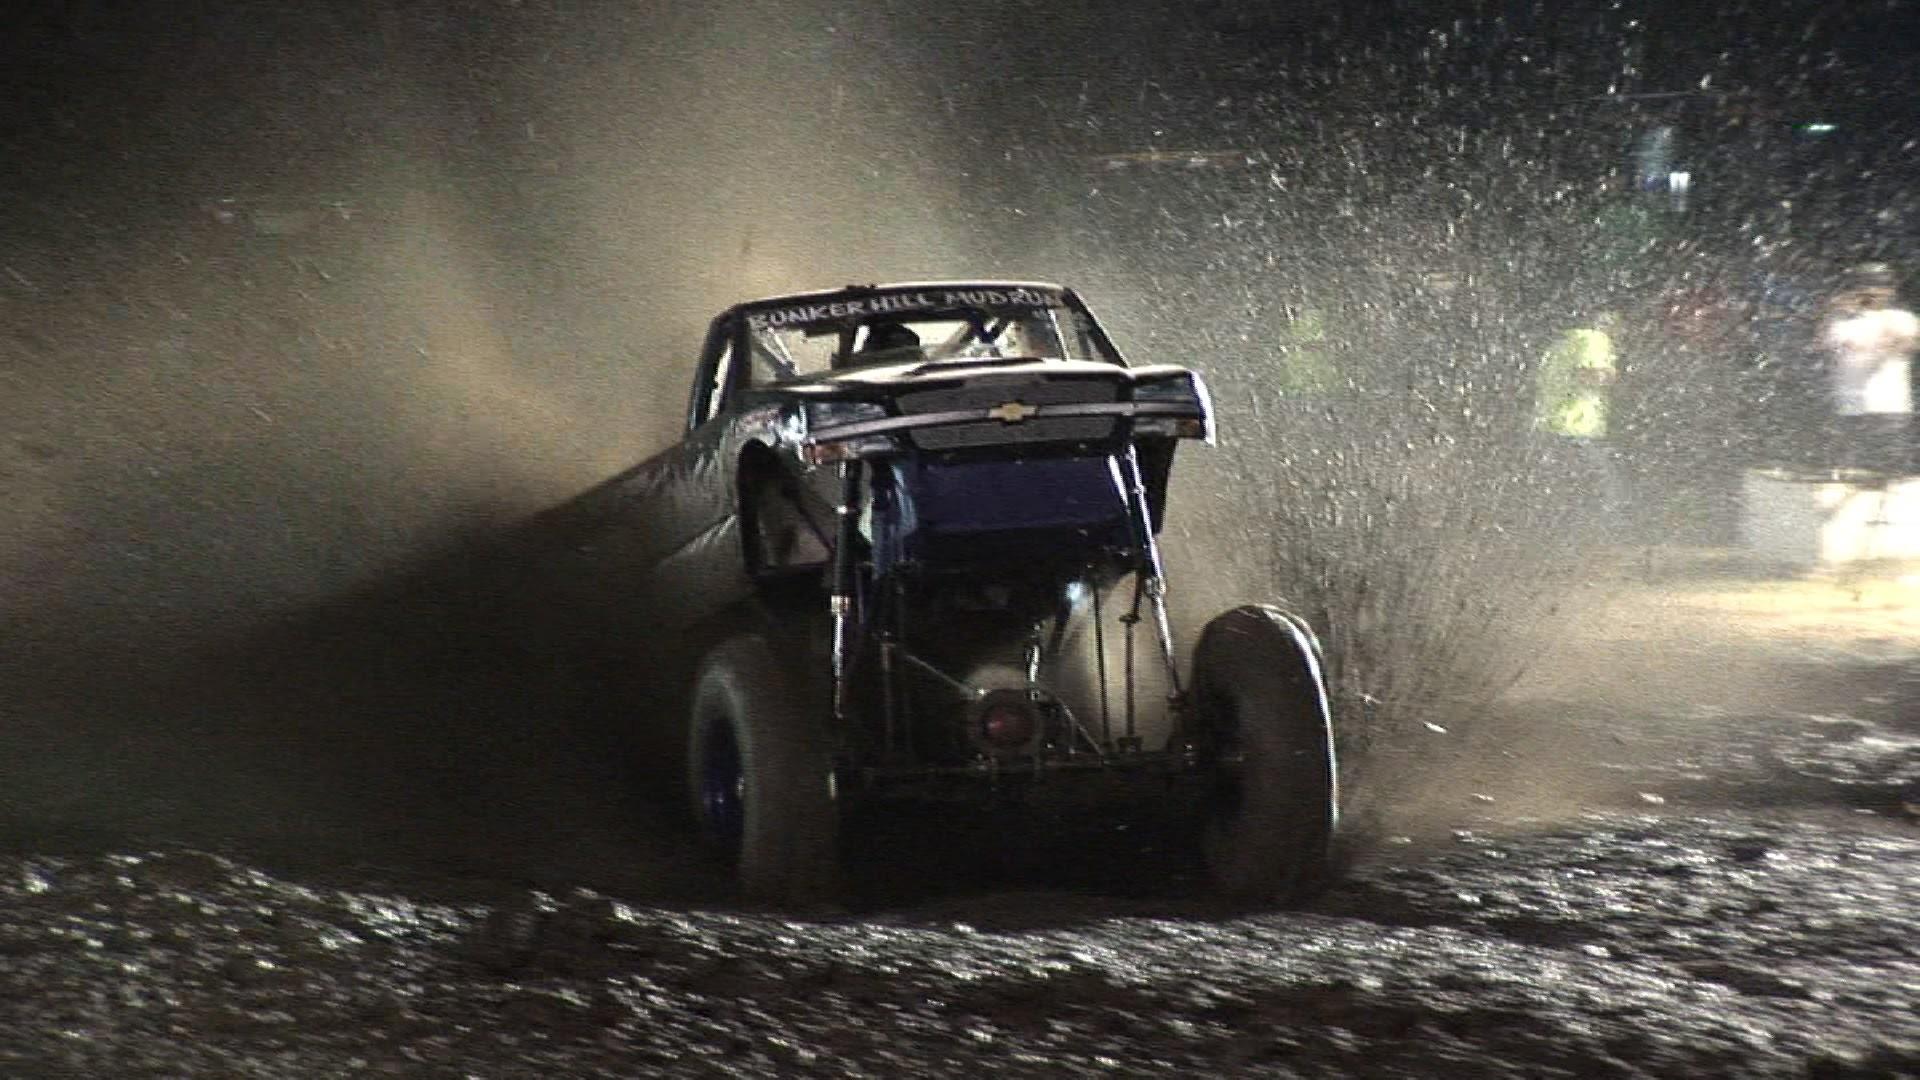 59 Mud Trucks Wallpapers on WallpaperPlay 1920x1080